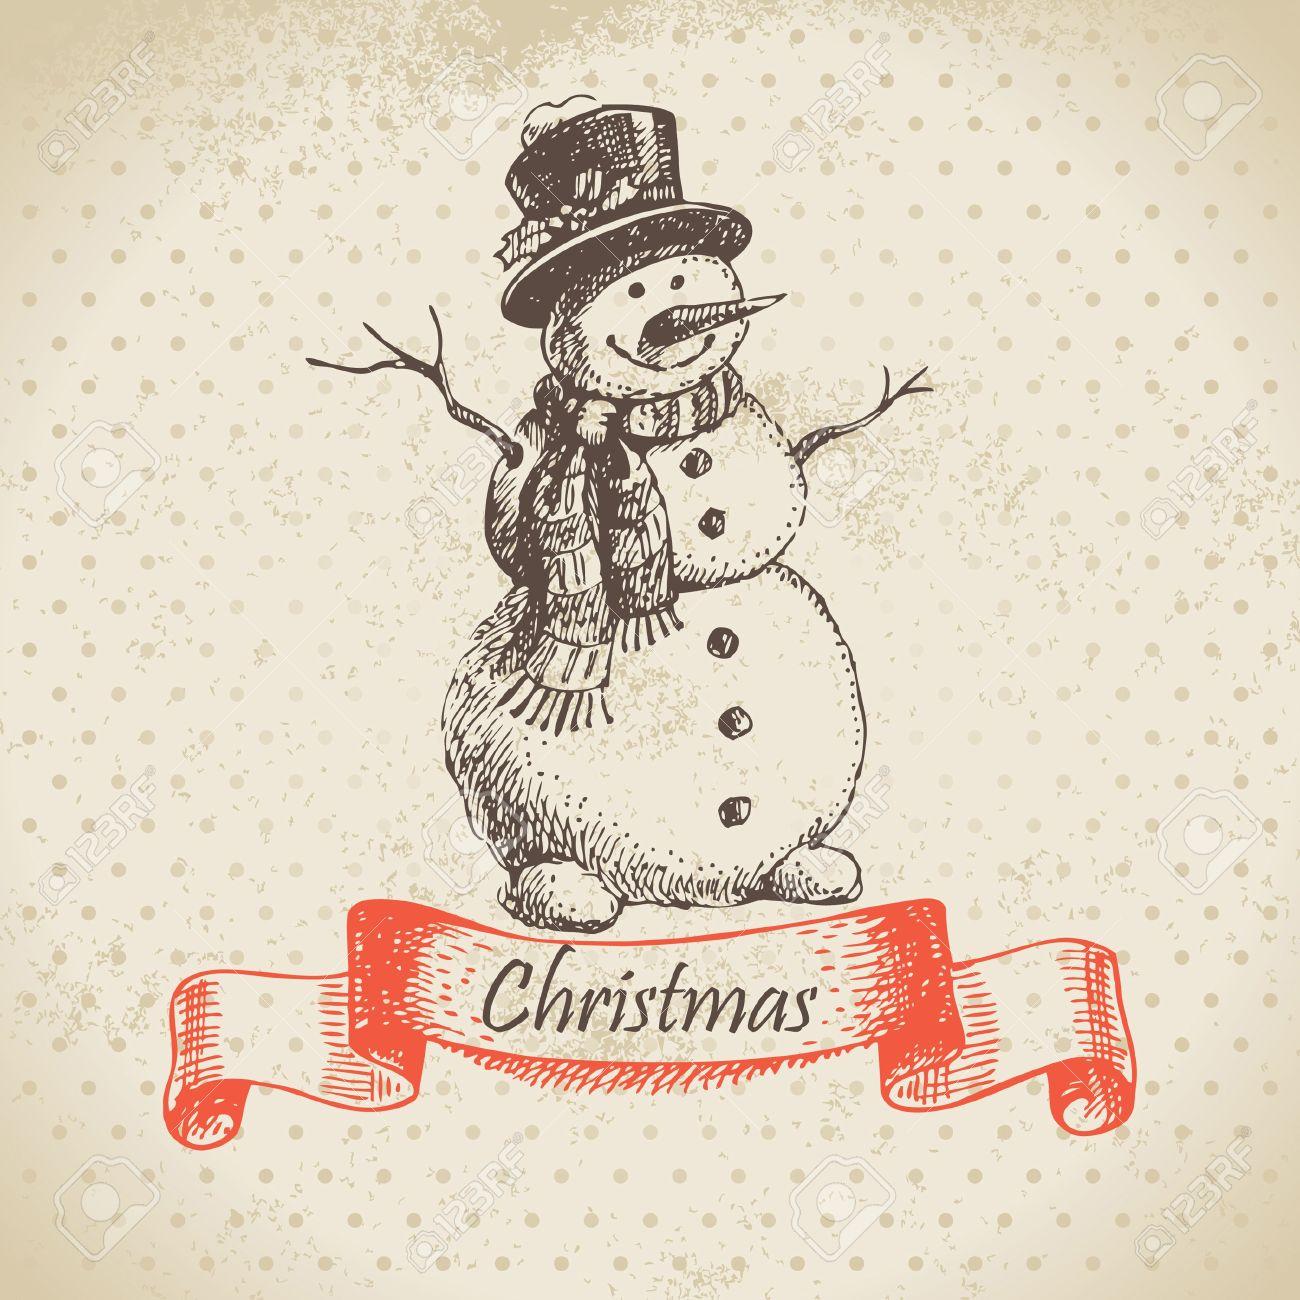 Christmas snowman. Hand drawn illustration Stock Vector - 16200772